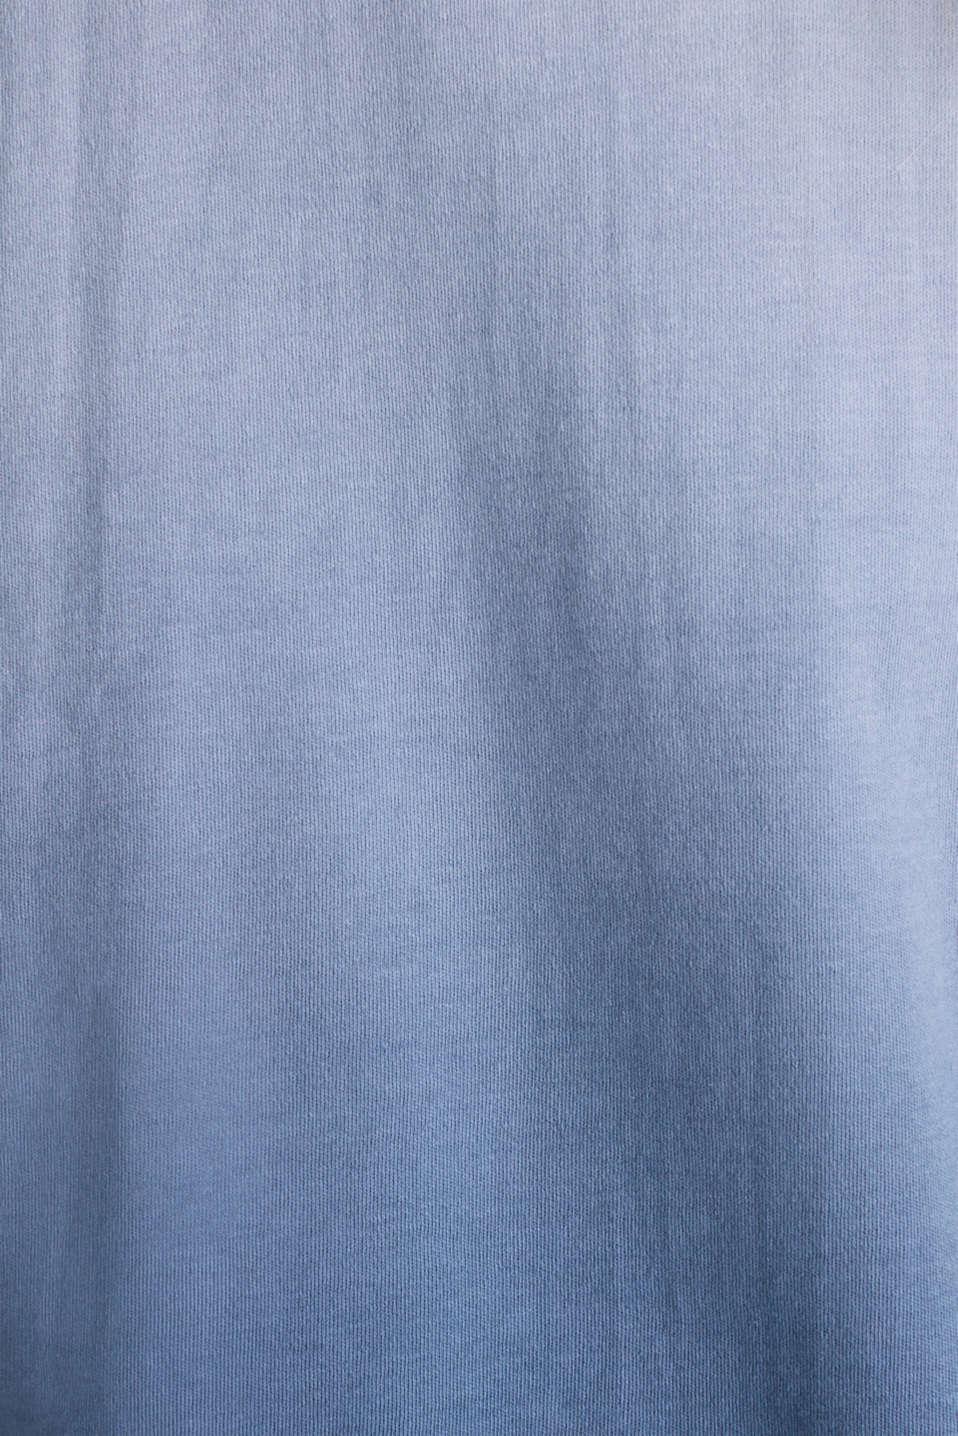 Dip-dye top, 100% cotton, BLUE LAVENDER, detail image number 4